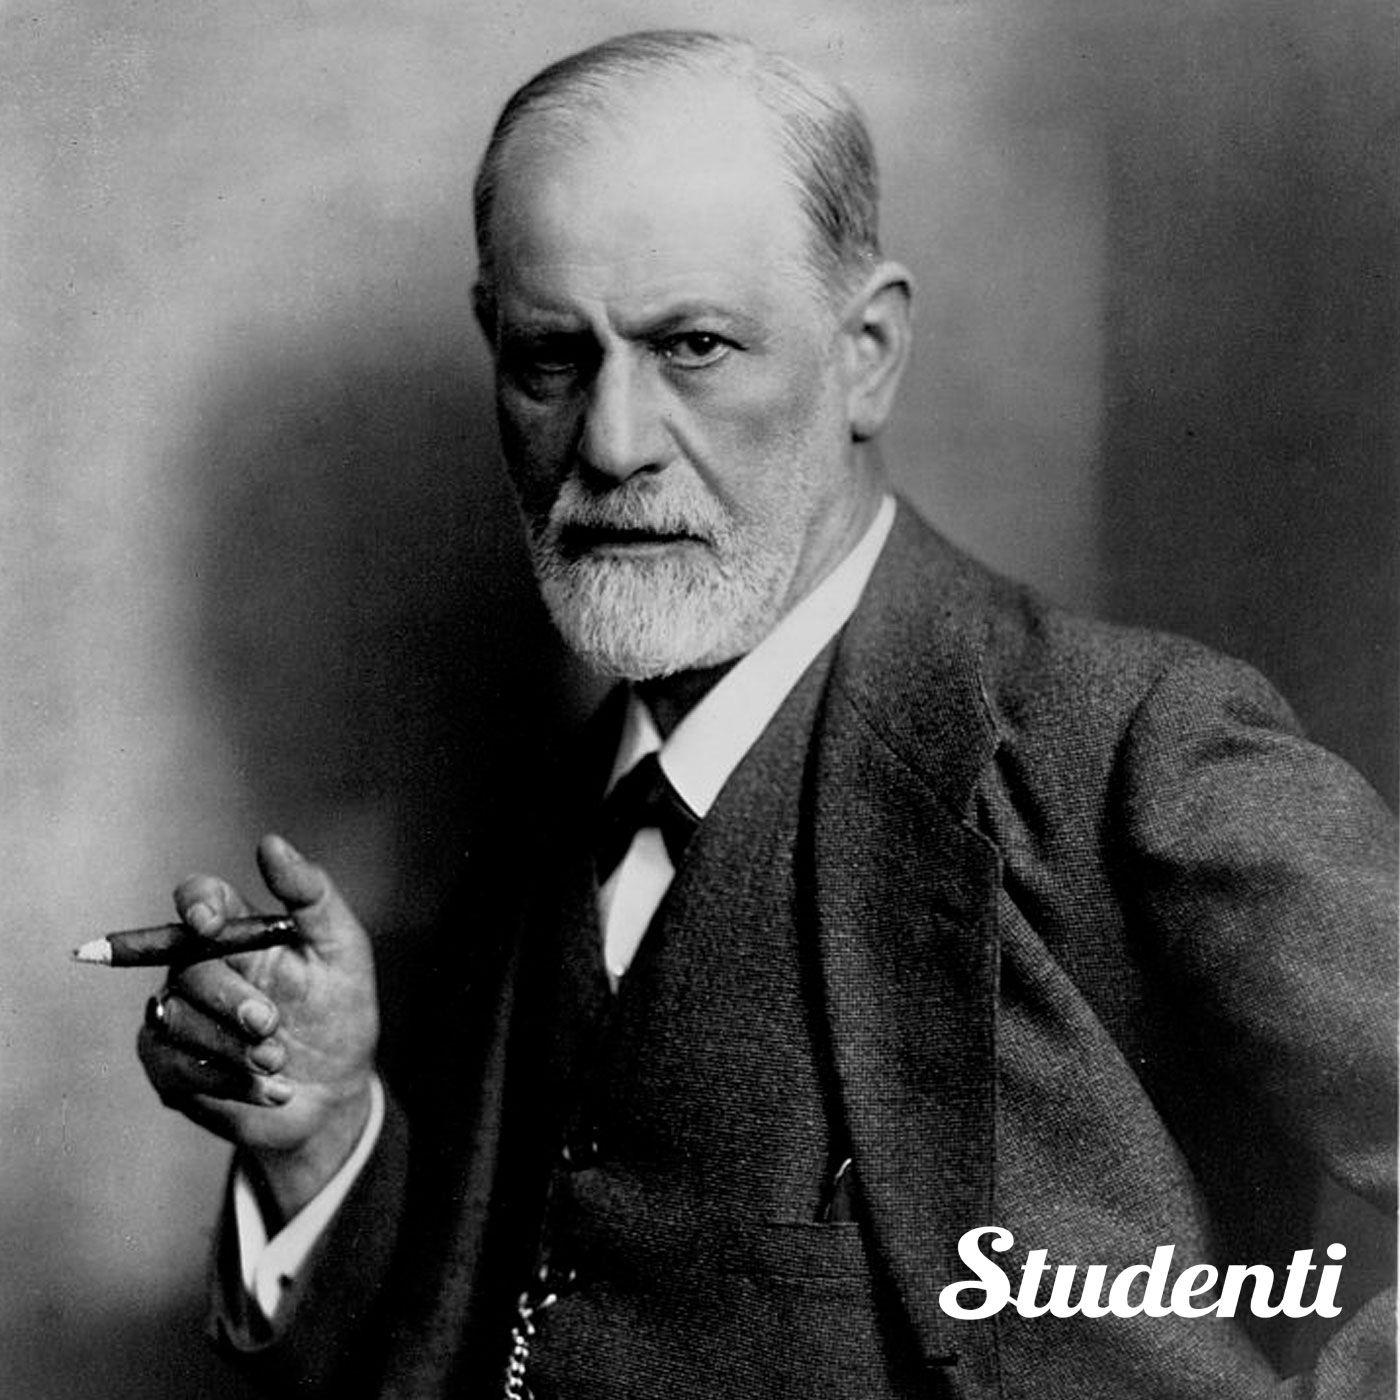 Biografie - Sigmund Freud